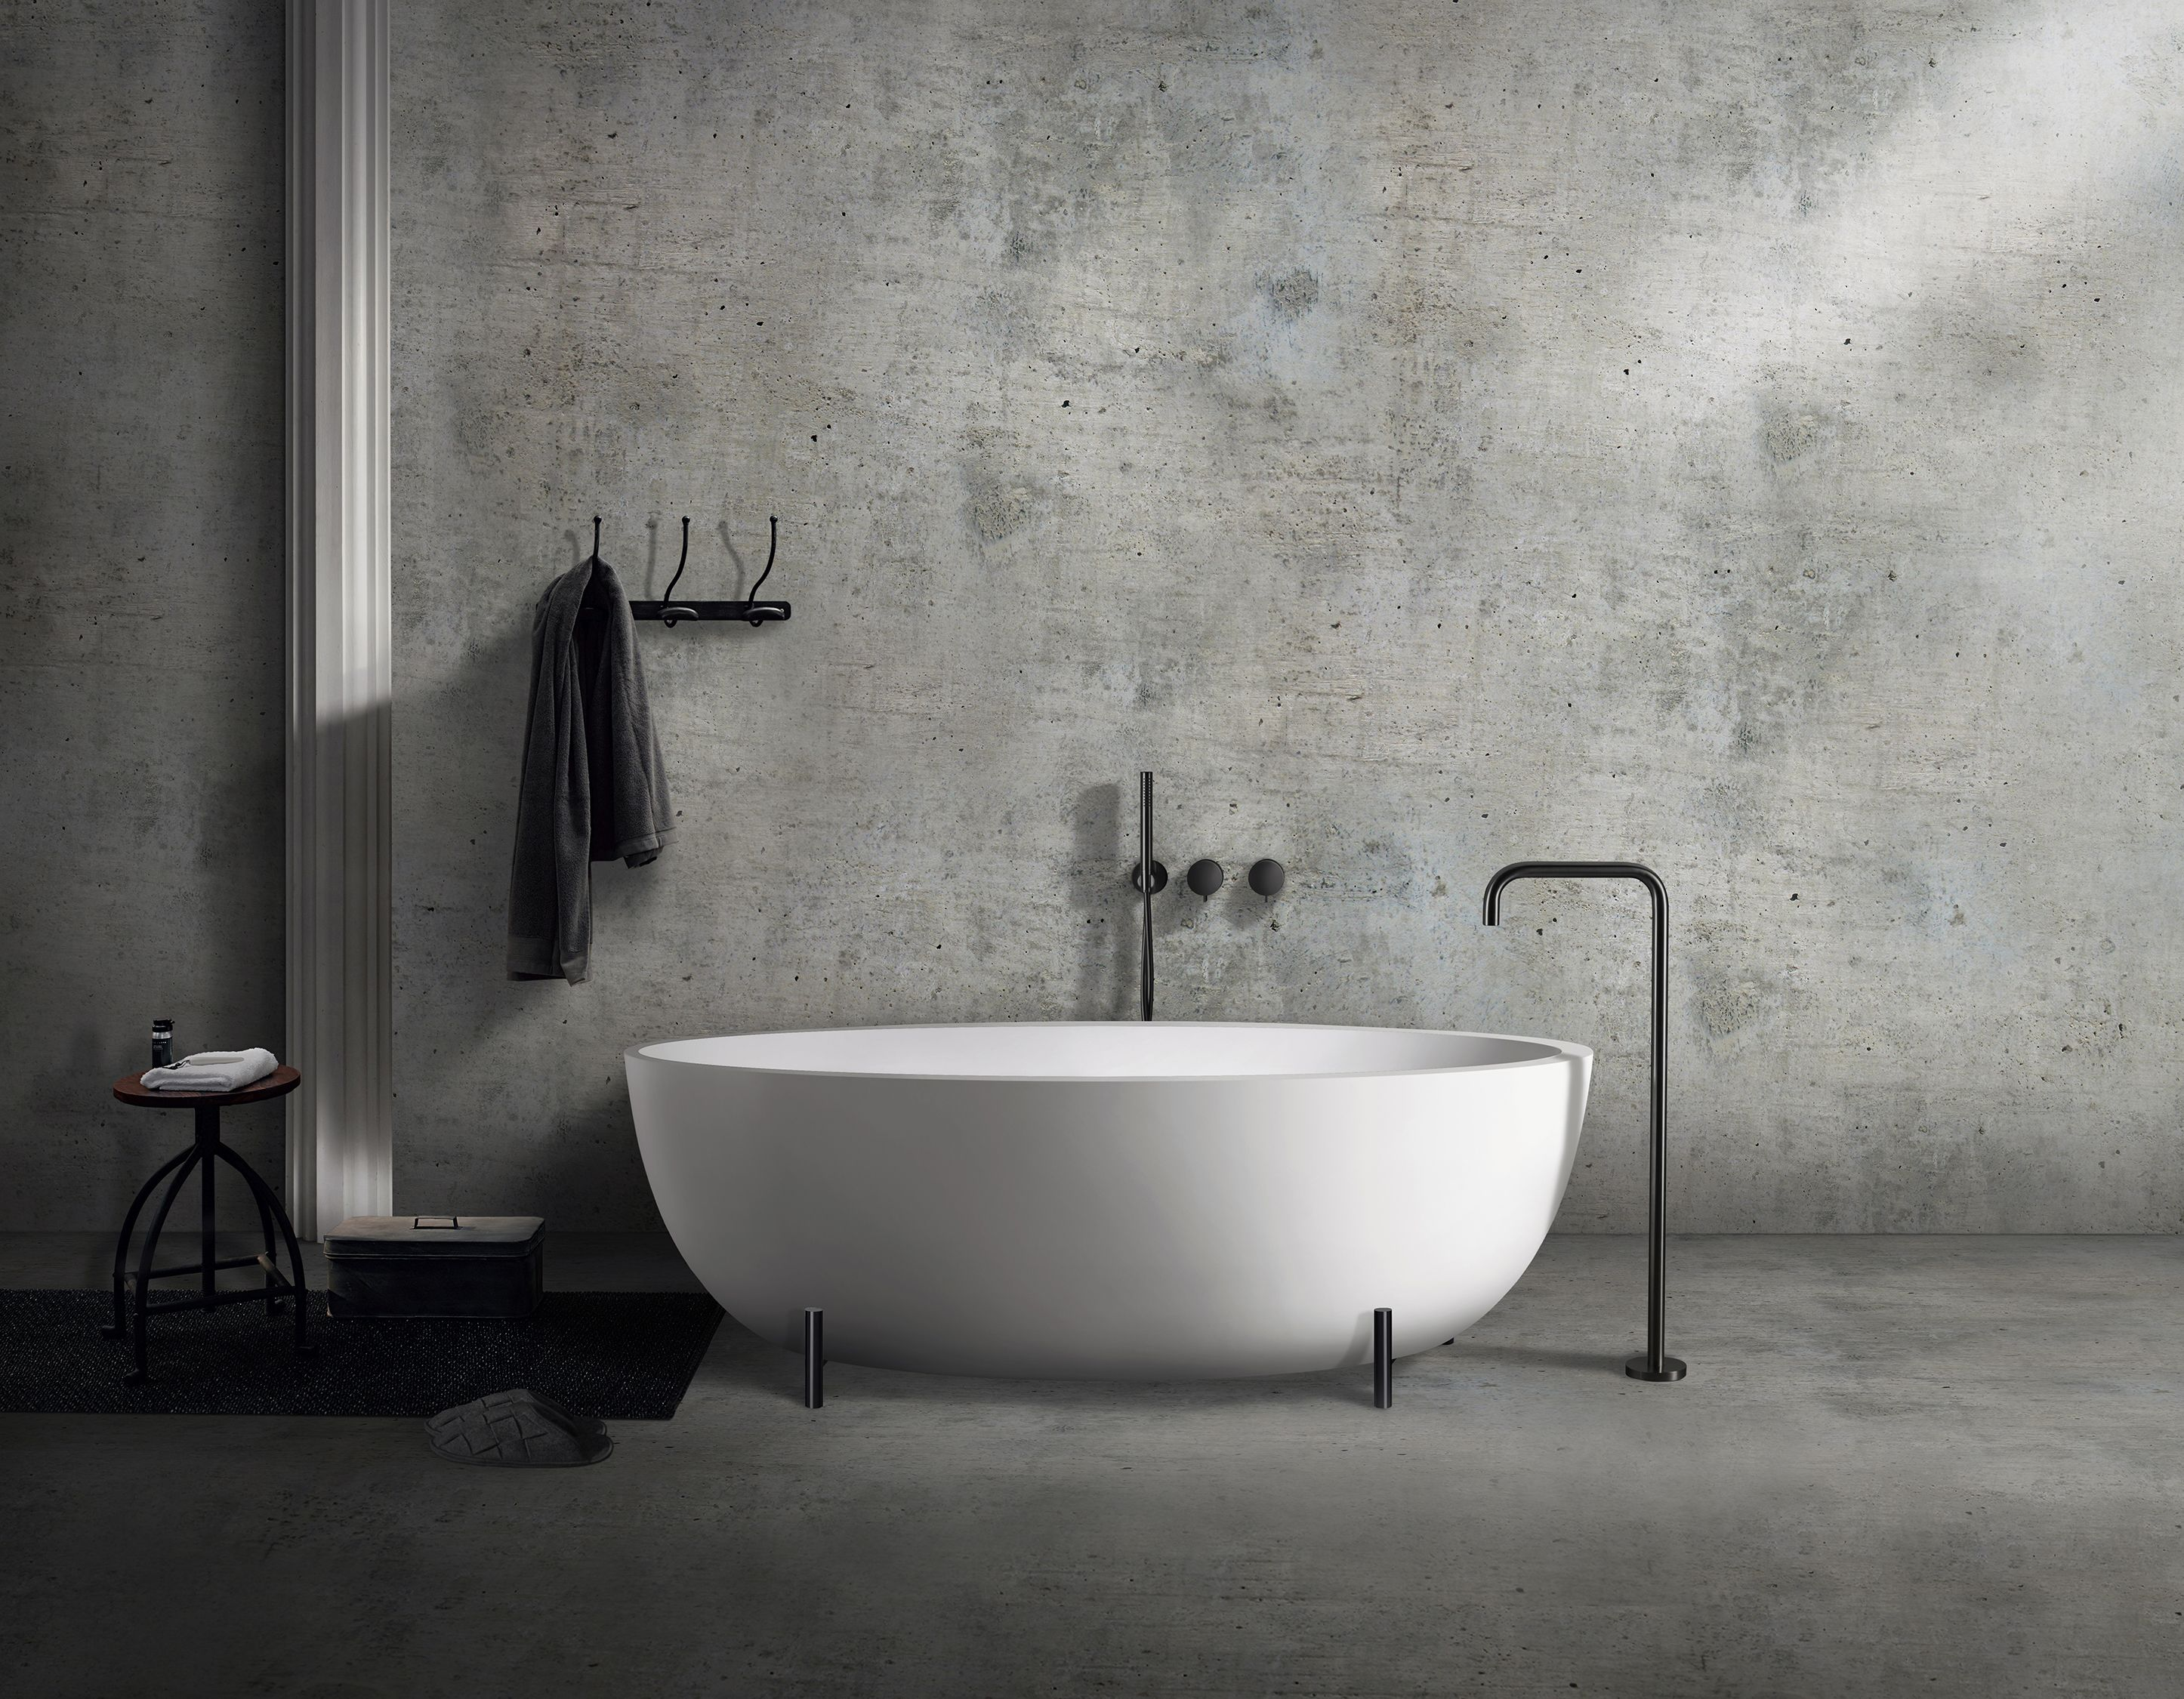 Introducing Our Modern Take On The Vintage Clawfoot Bathtubs This Contemporary Matte Black Steel Legs He Modern Bathroom Design Bathtub Design Modern Bathroom